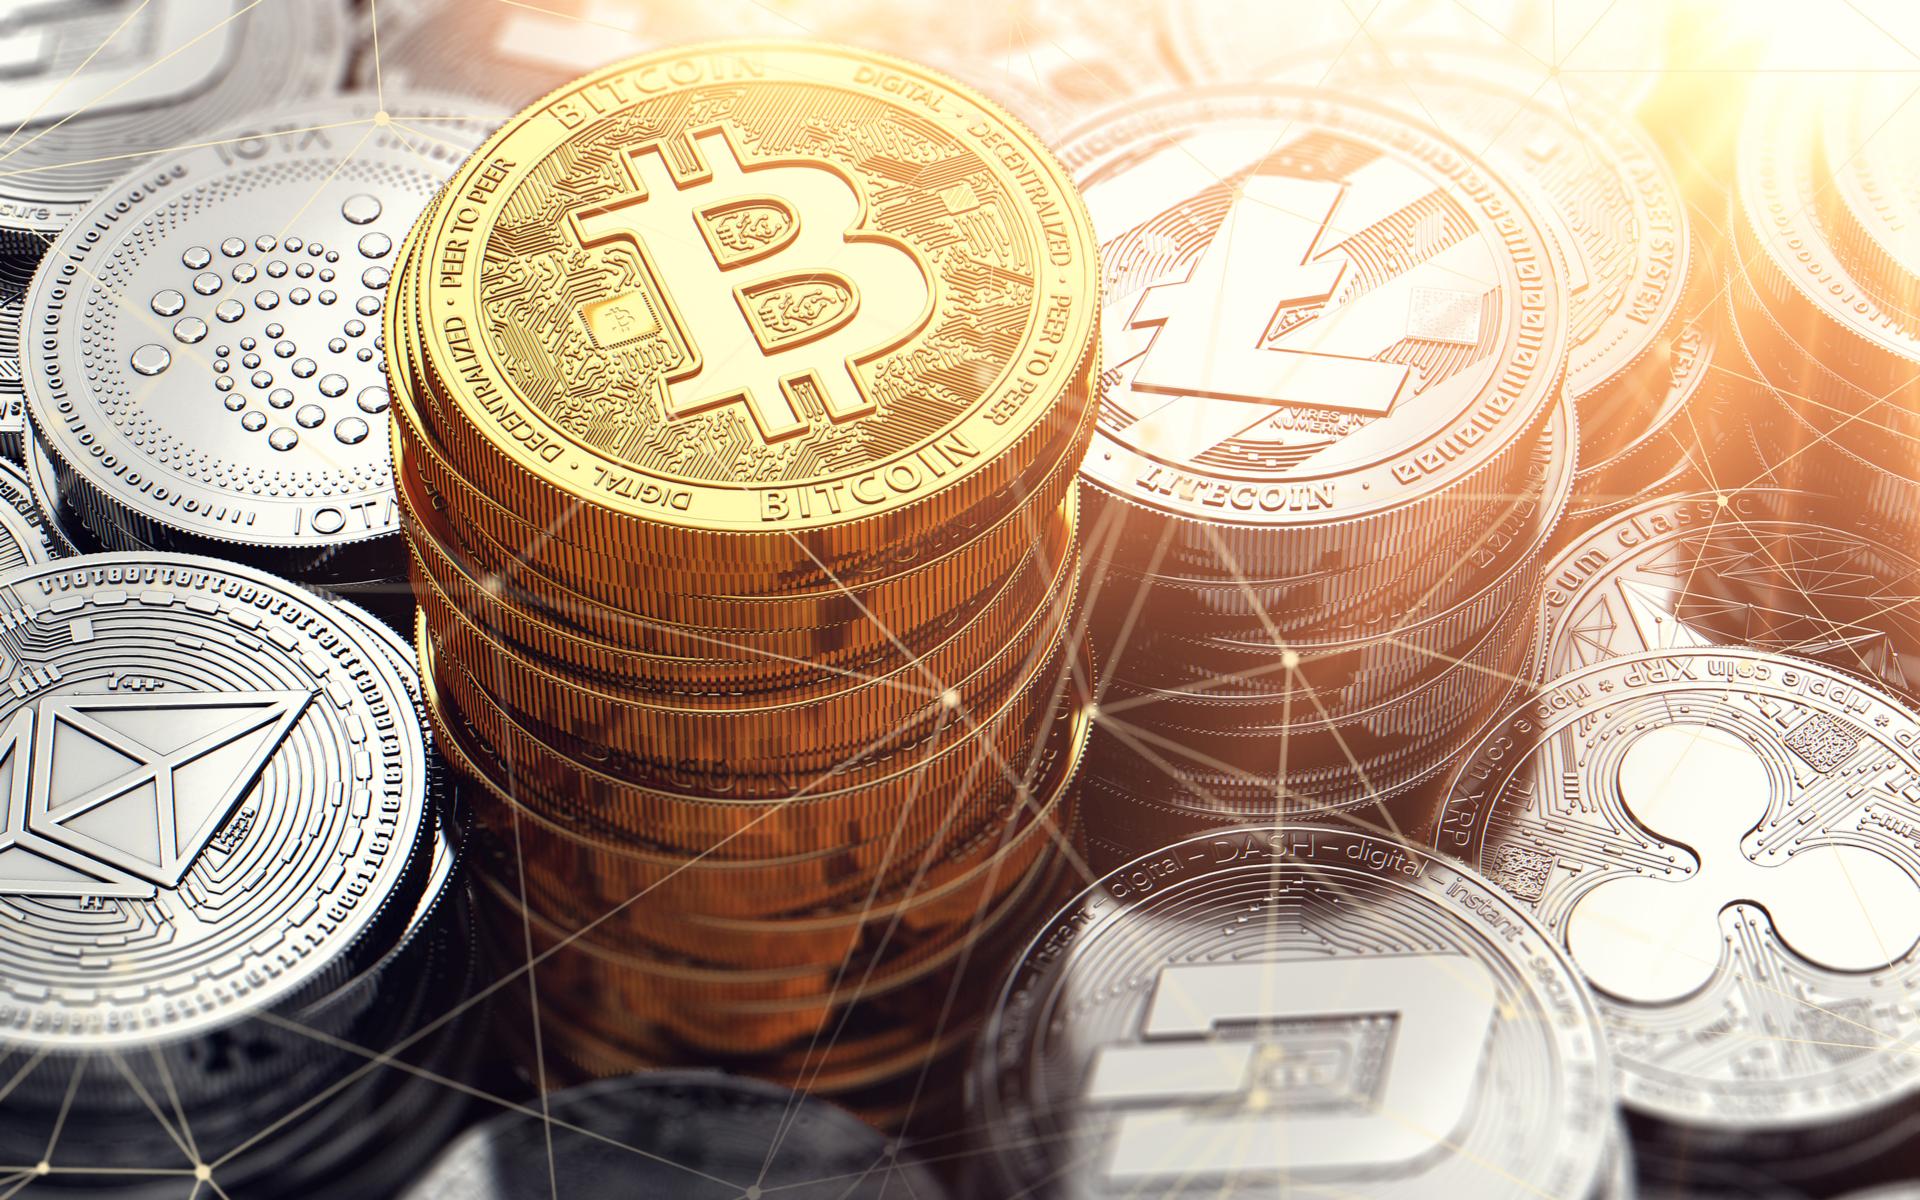 Bitcoin price and dominance rally